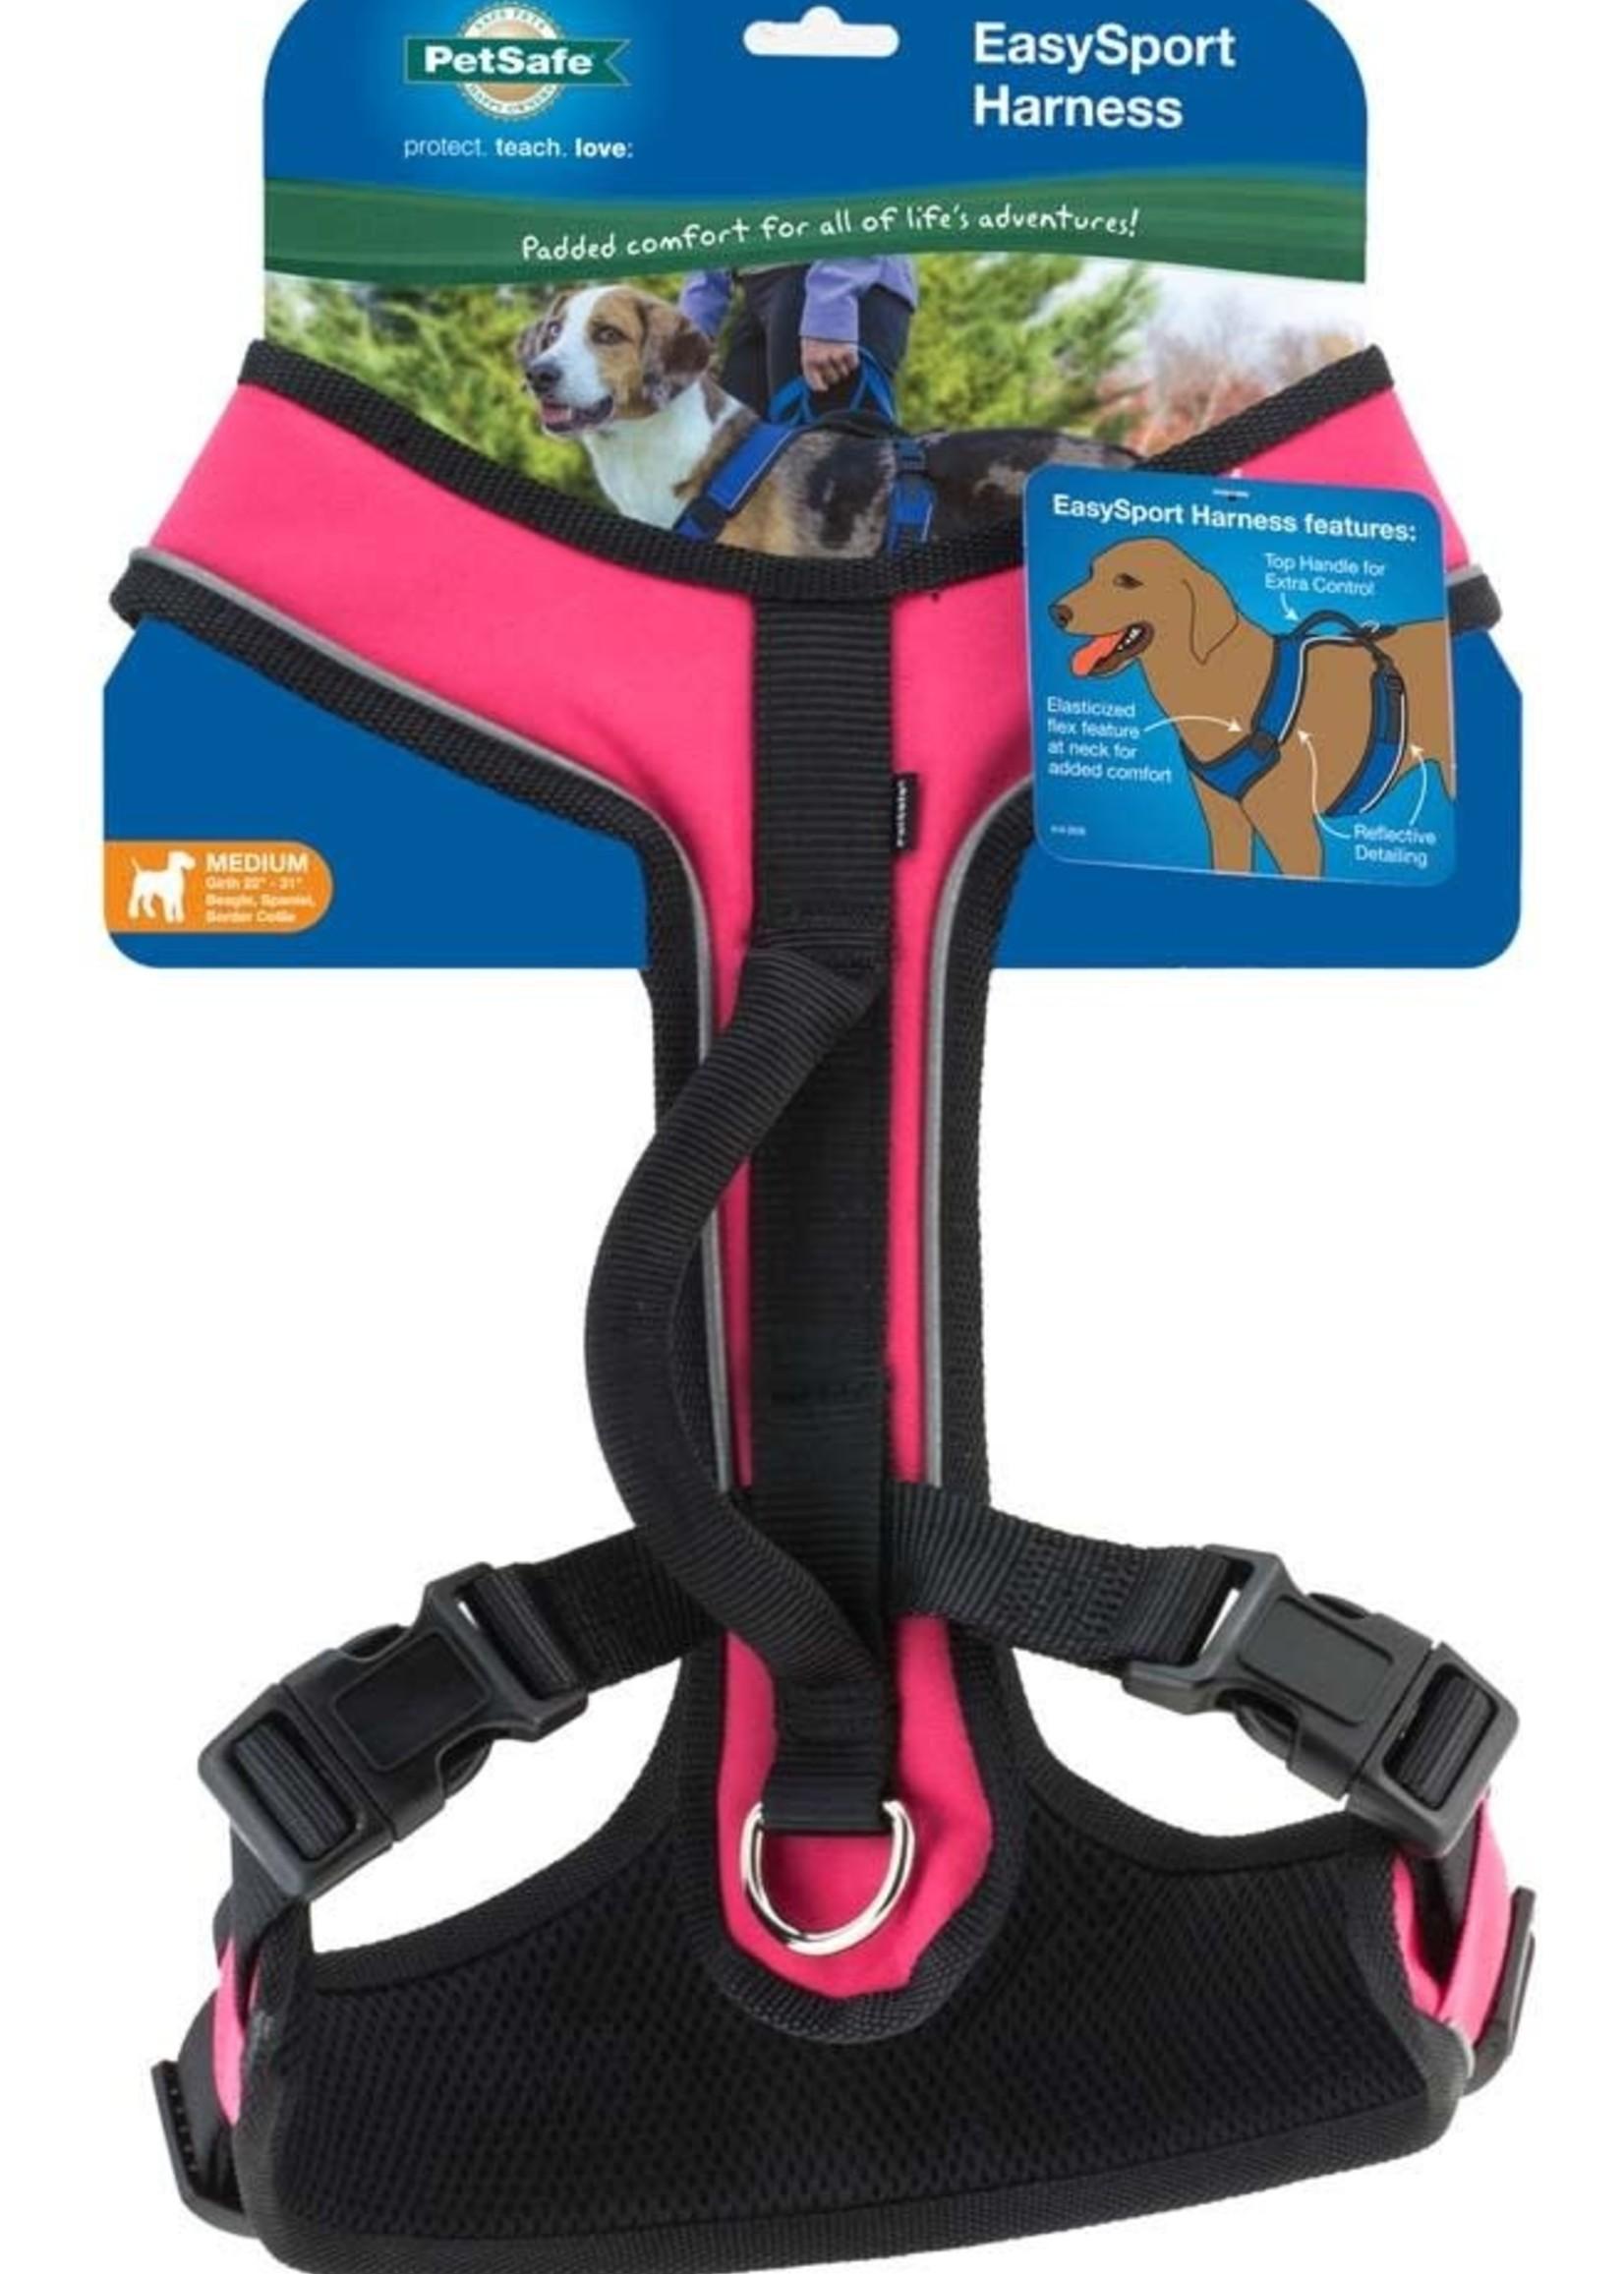 PetSafe Pet Safe Easysport Harness Pink Medium